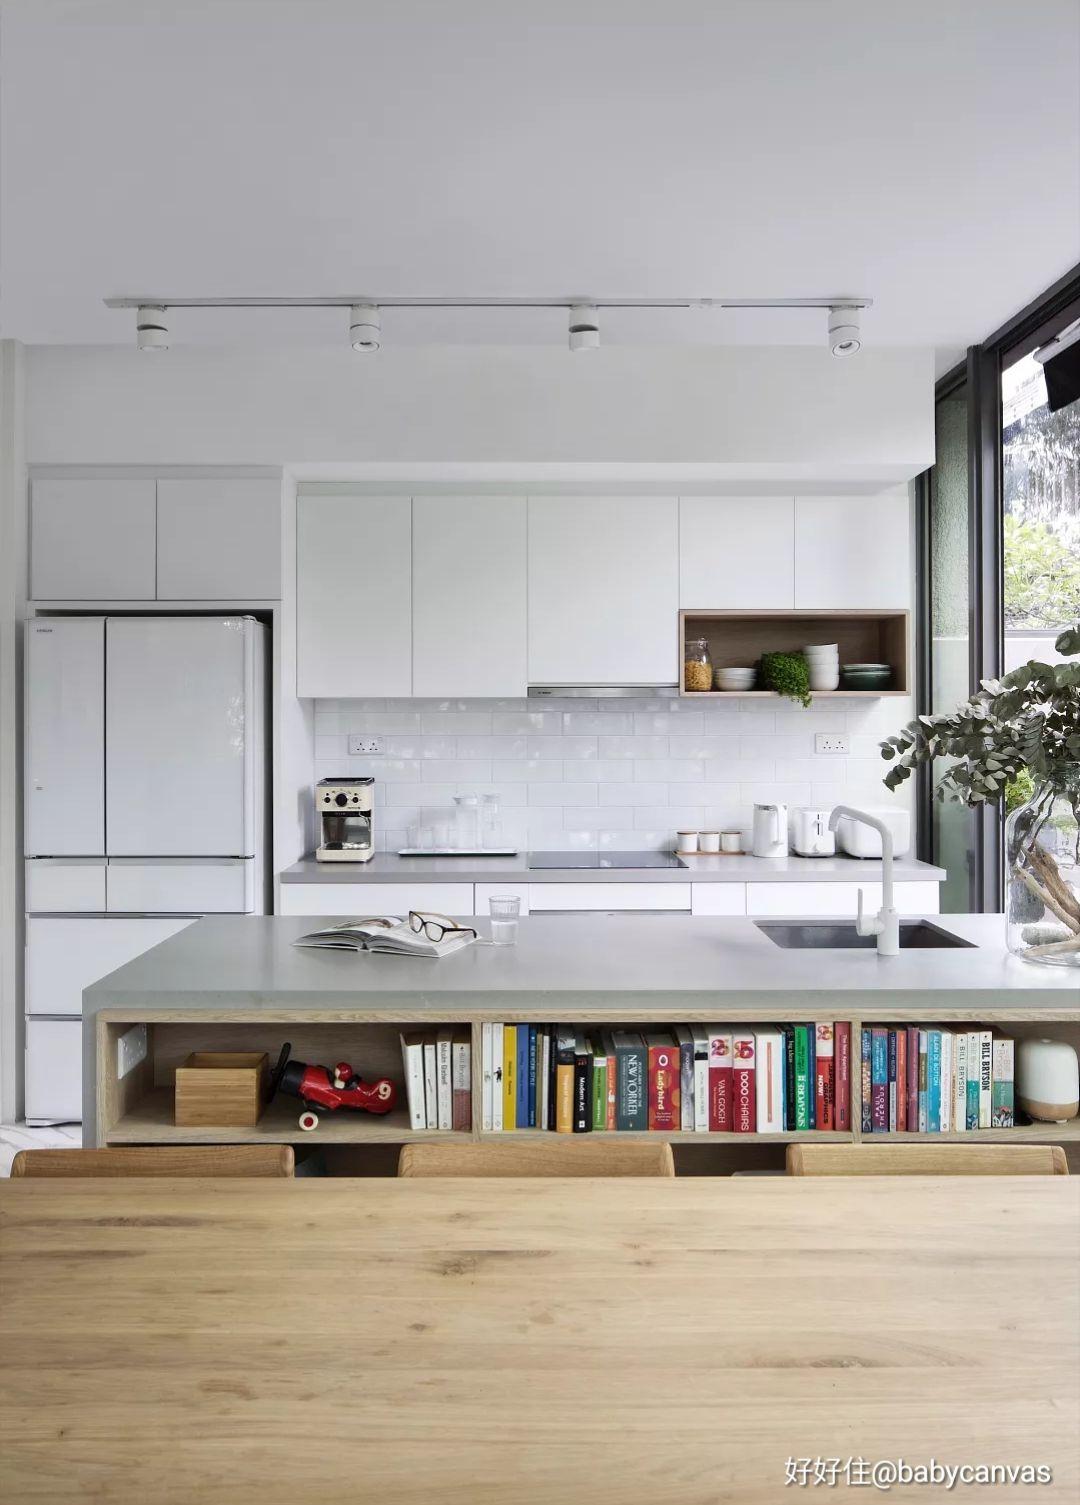 Interior design website best inspiration new homeowner home also pin by supermannd on decor in pinterest rh